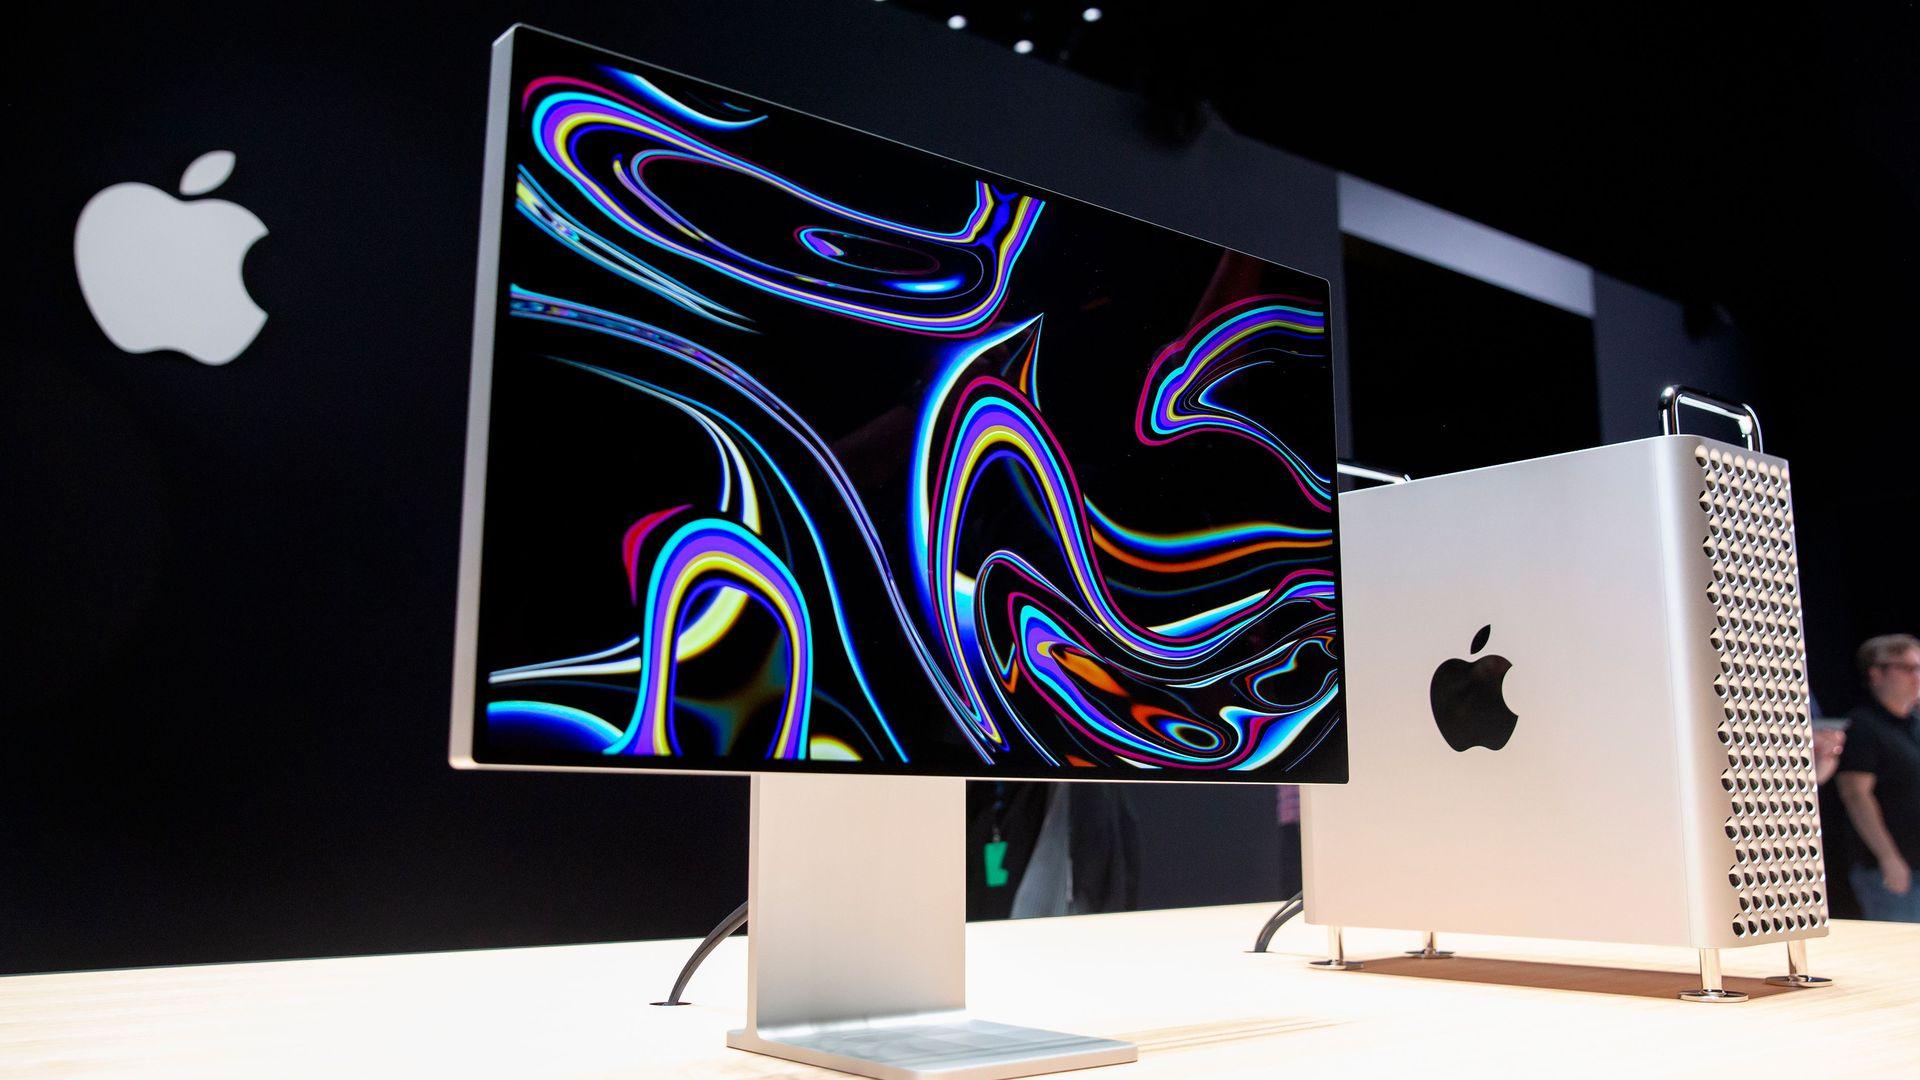 Apple's Mac Pro desktop